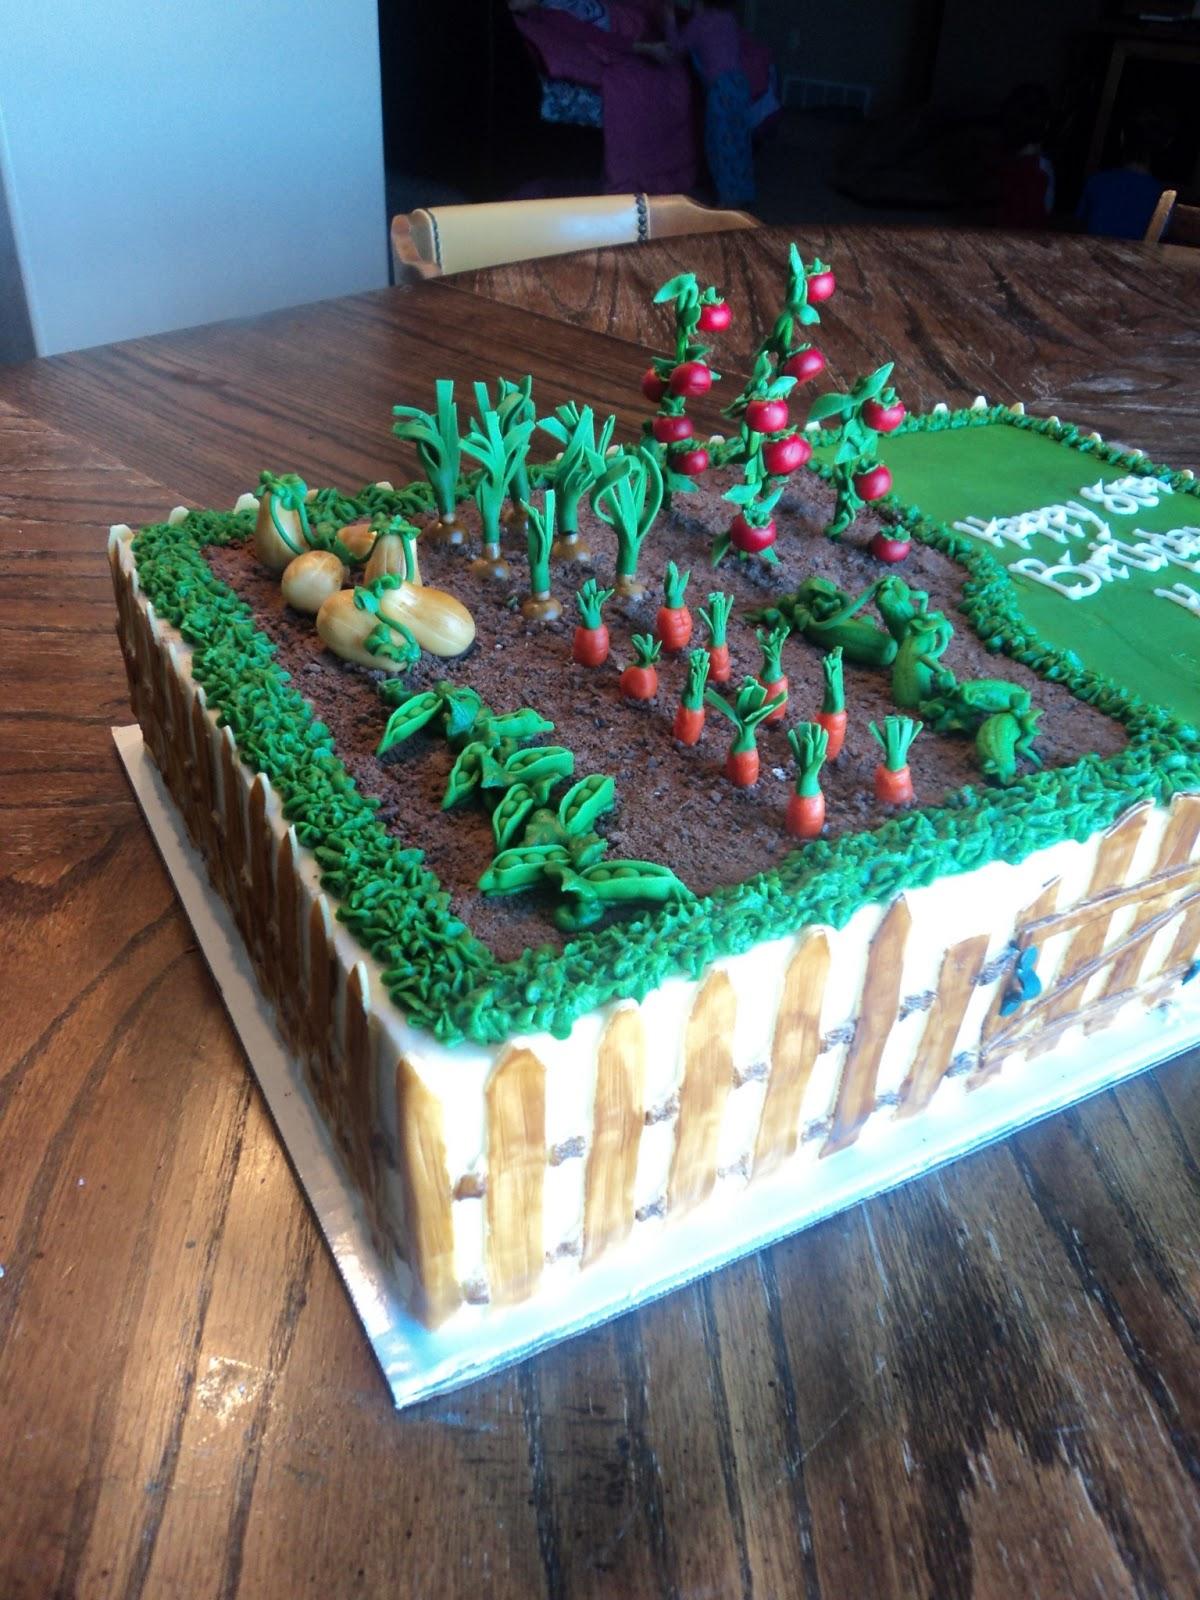 Delectable Cakes Vegetable Garden Birthday Cake